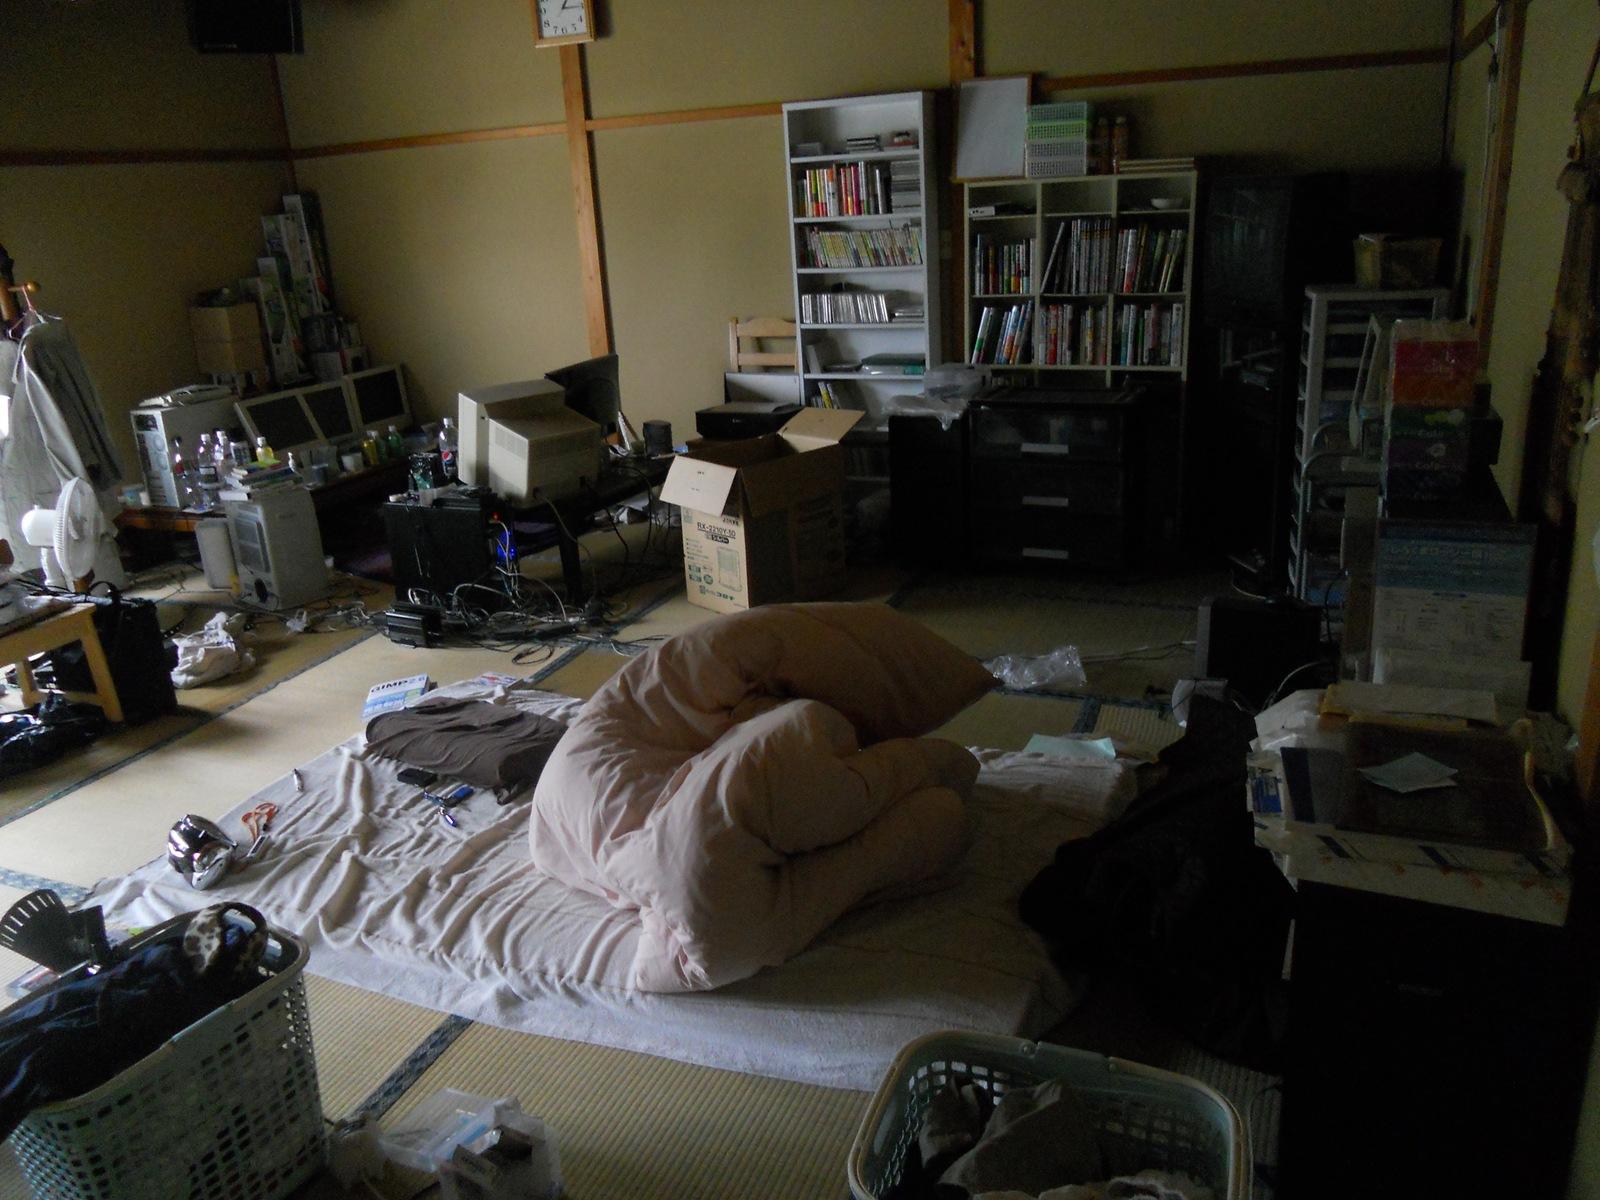 GW6日目:11.05.04:部屋の掃除!